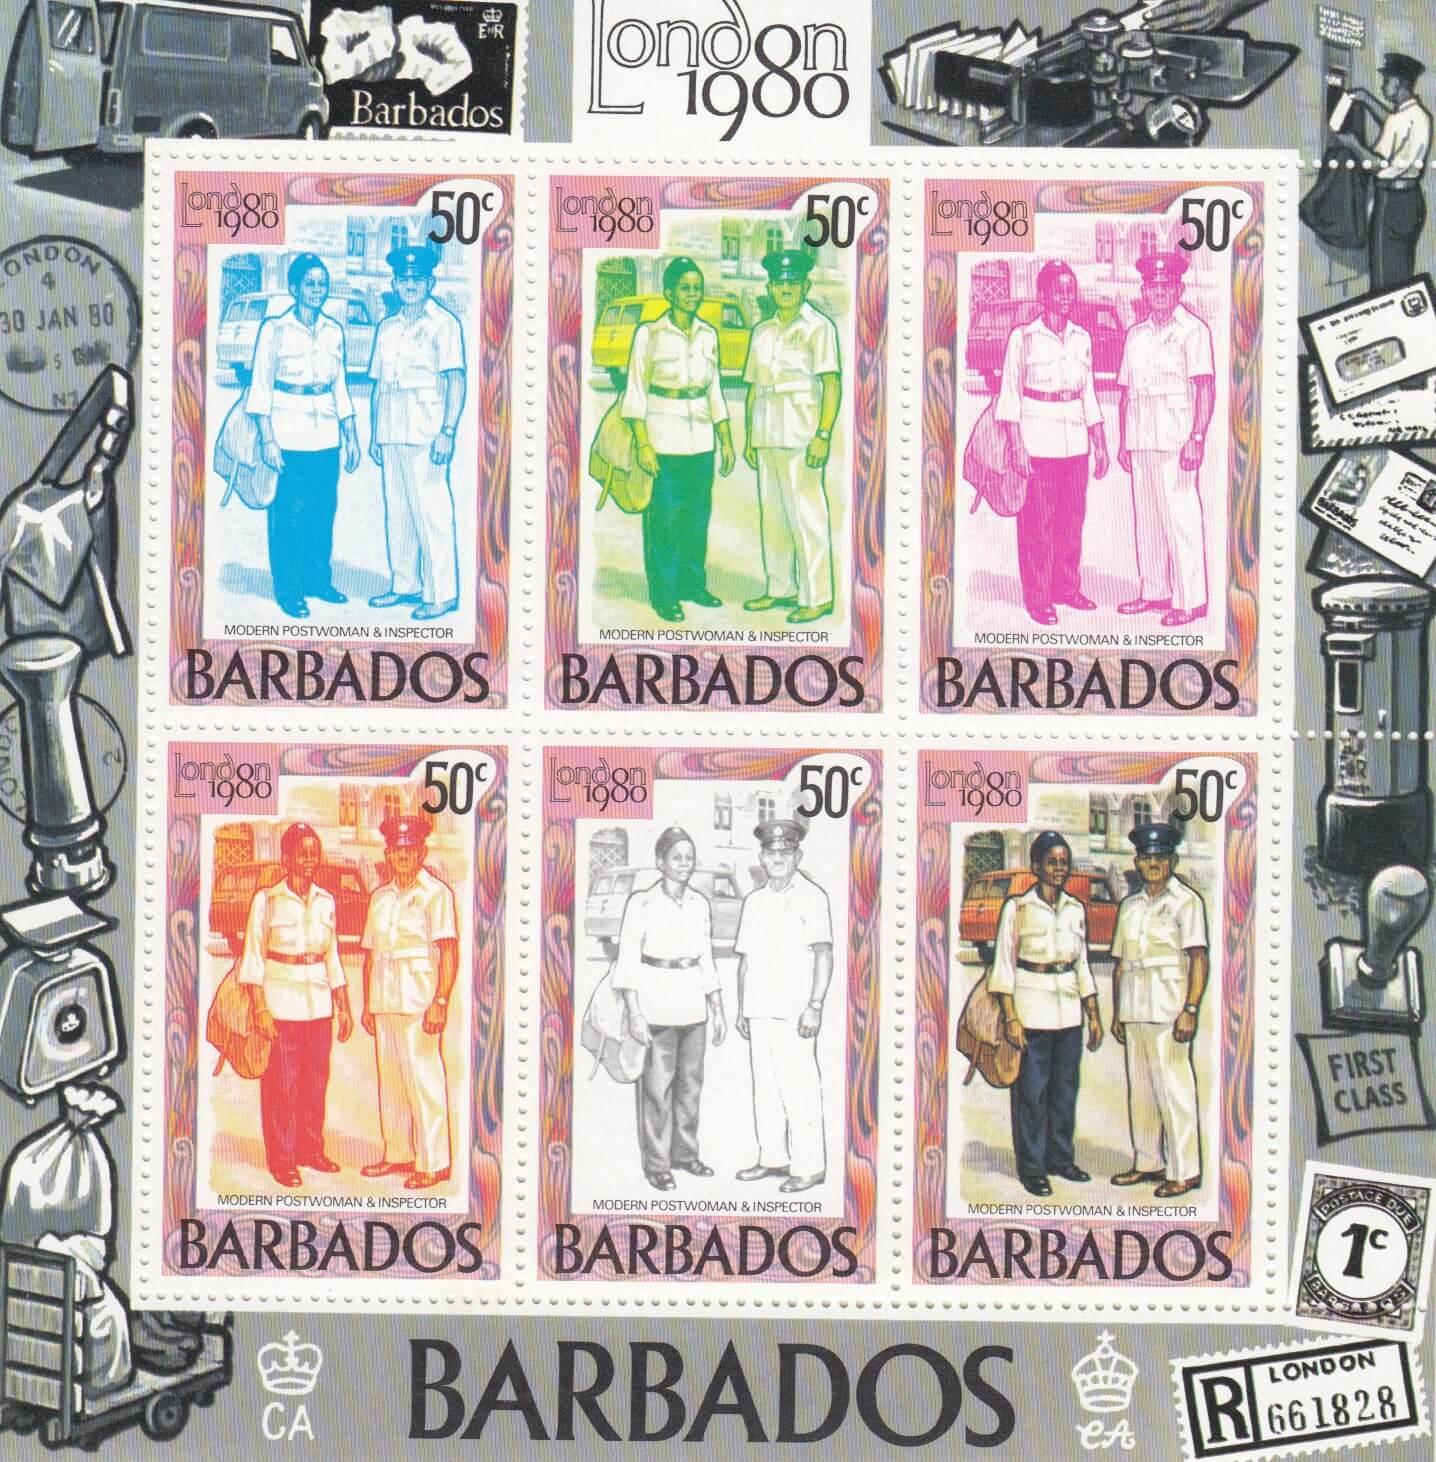 Barbados SGMS659b | London 1980 International Stamp Exhibition